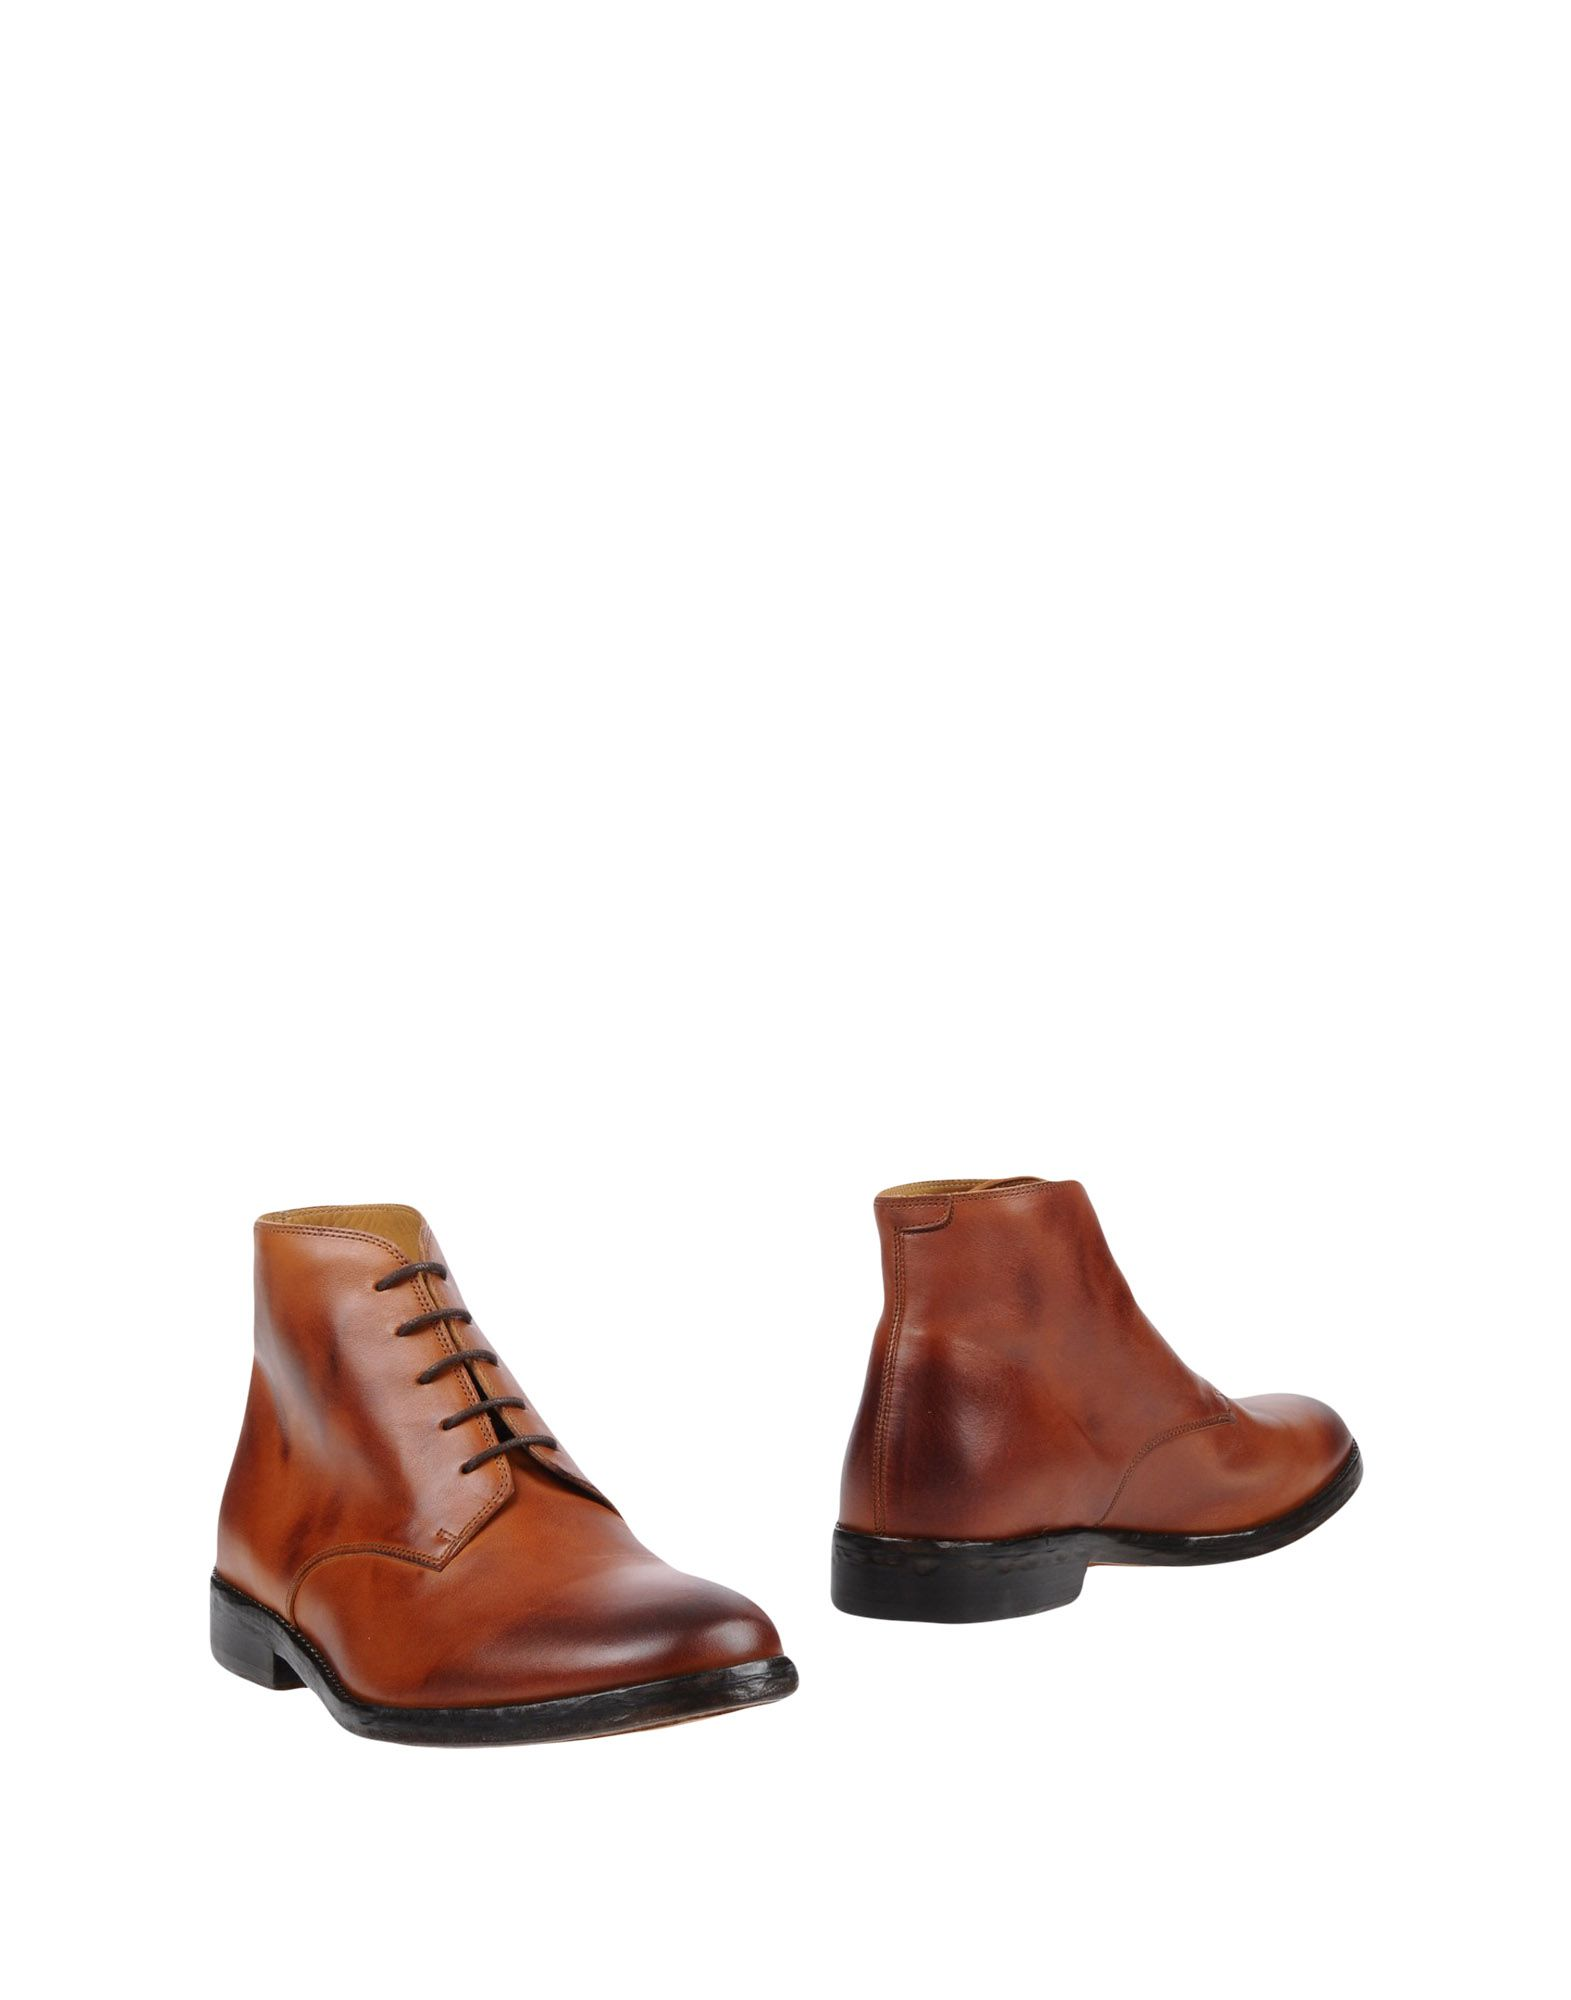 Royal Republiq Boots - Men Royal Republiq Boots online 11461025VX on  Canada - 11461025VX online 8f7b4c